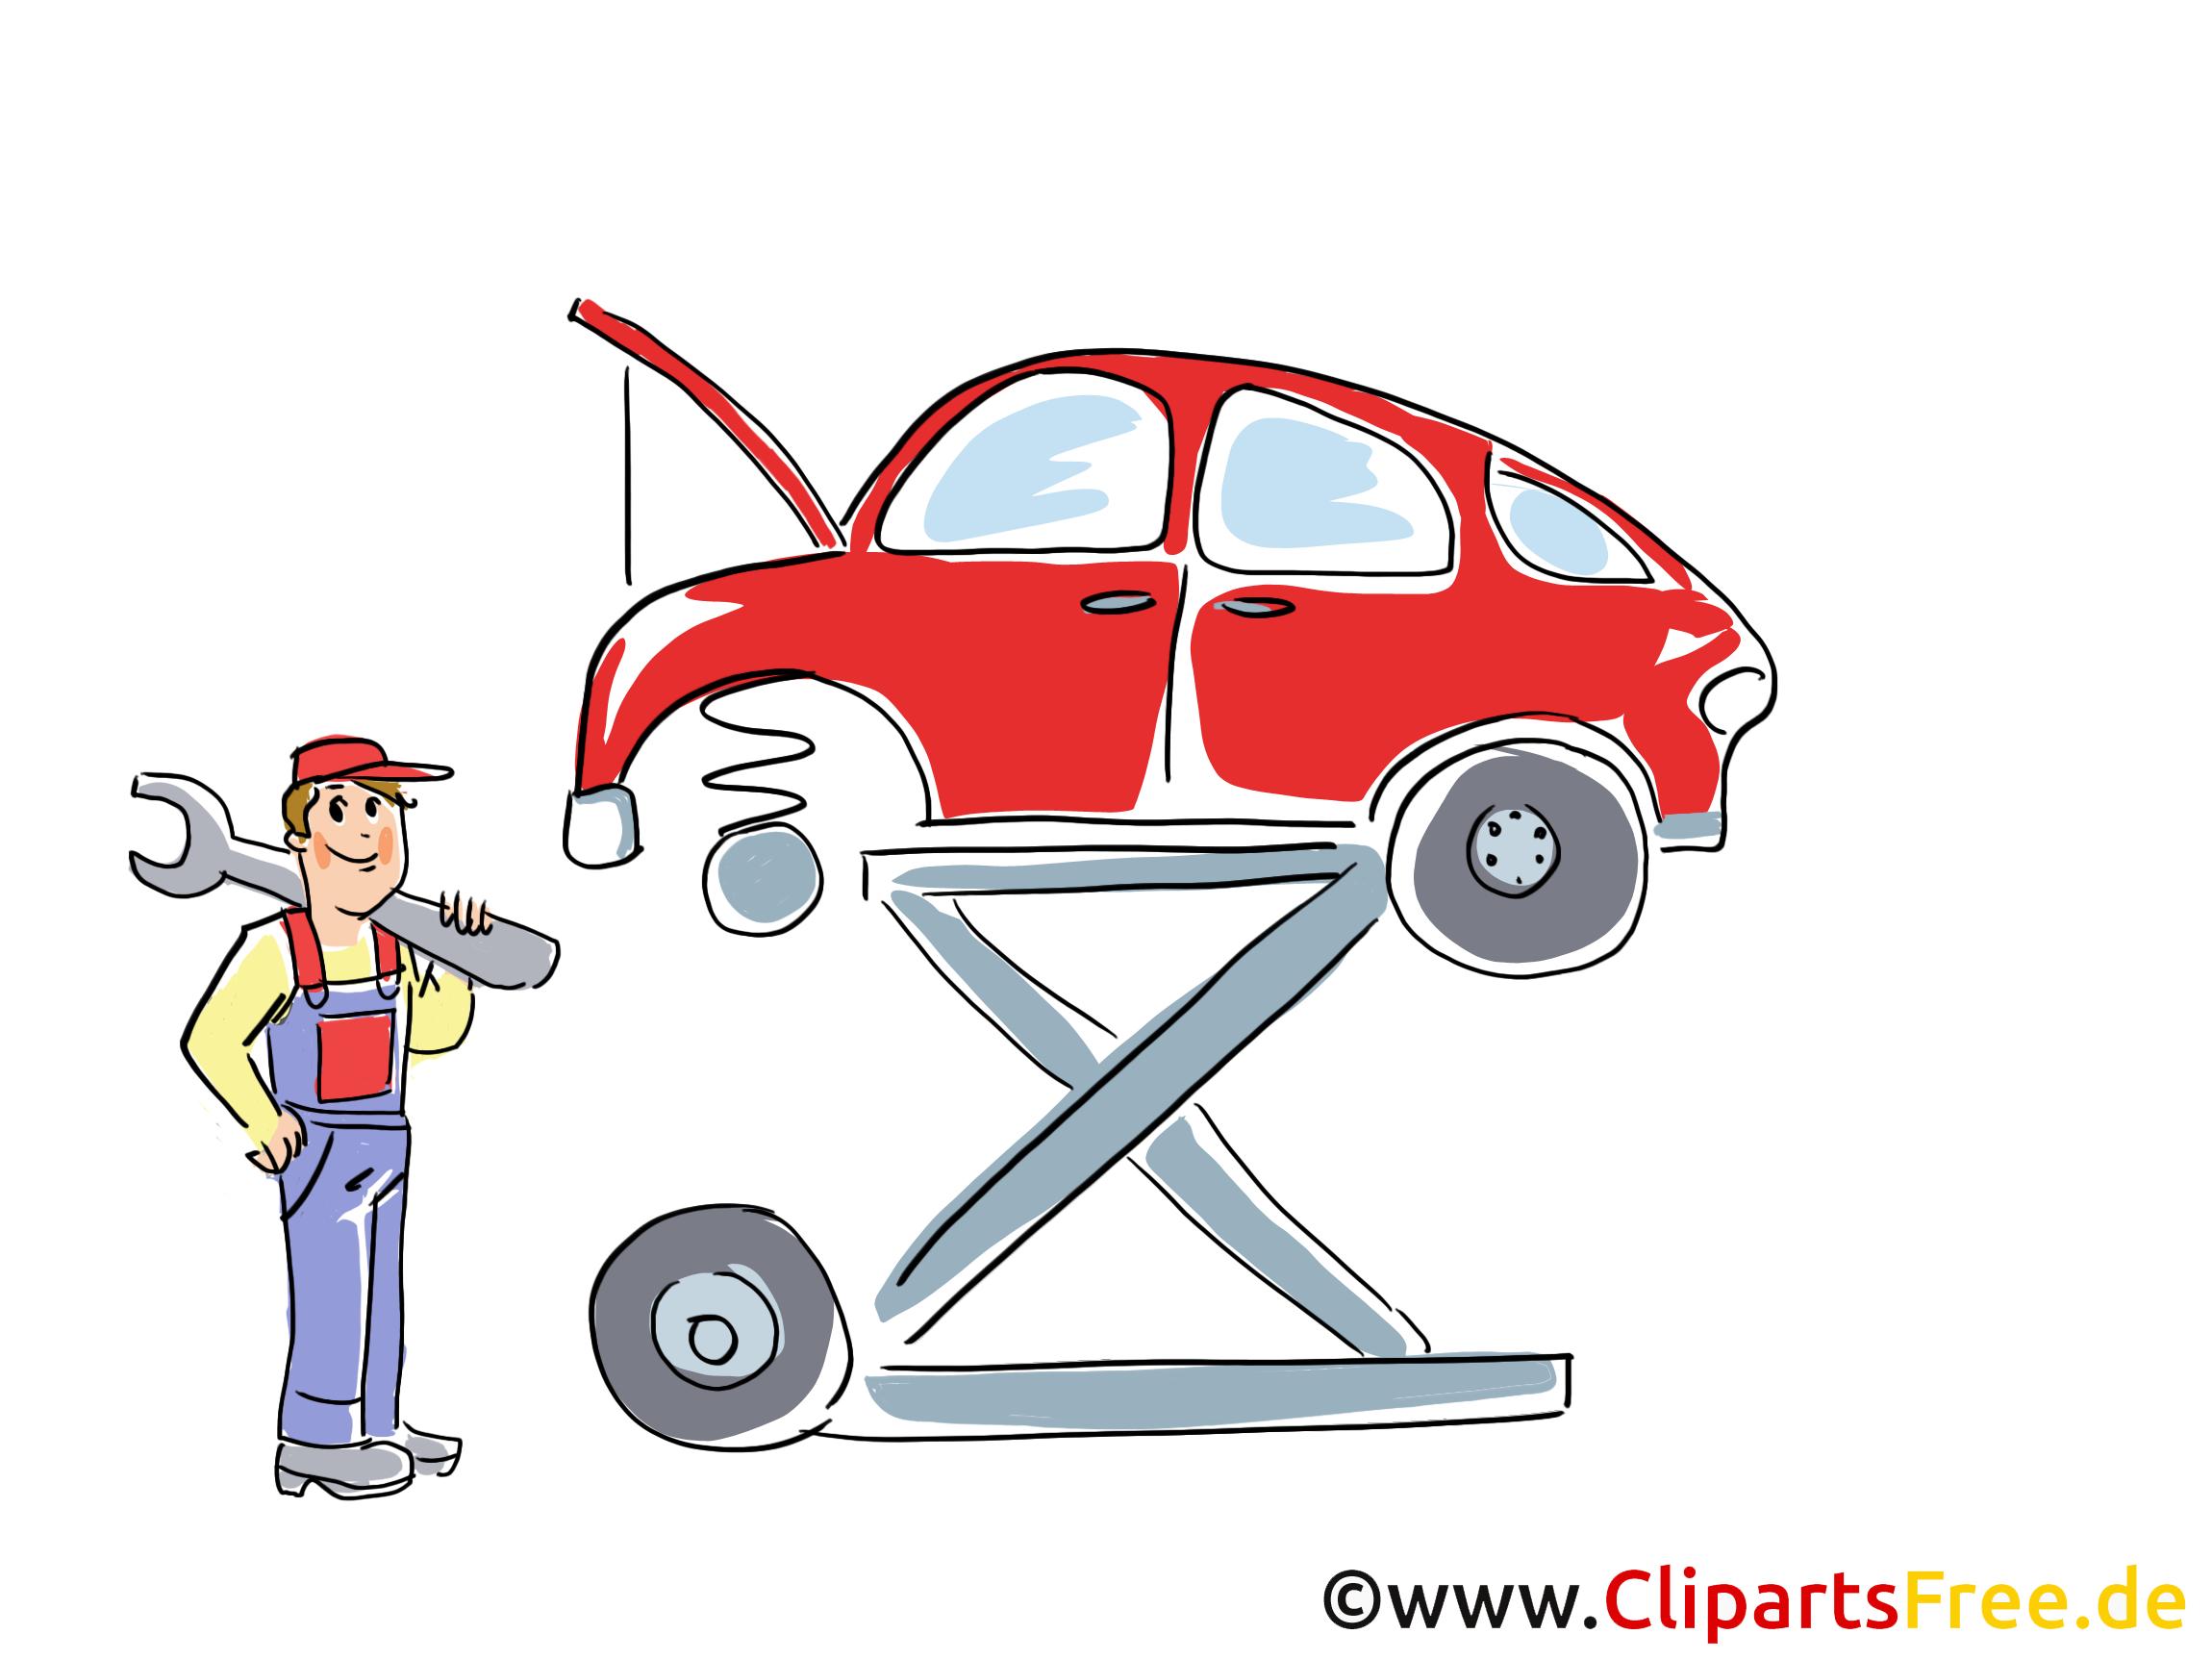 Autos clipart kostenlos image freeuse library Auto Bilder, Cliparts, Cartoons, Grafiken, Illustrationen, Gifs ... image freeuse library